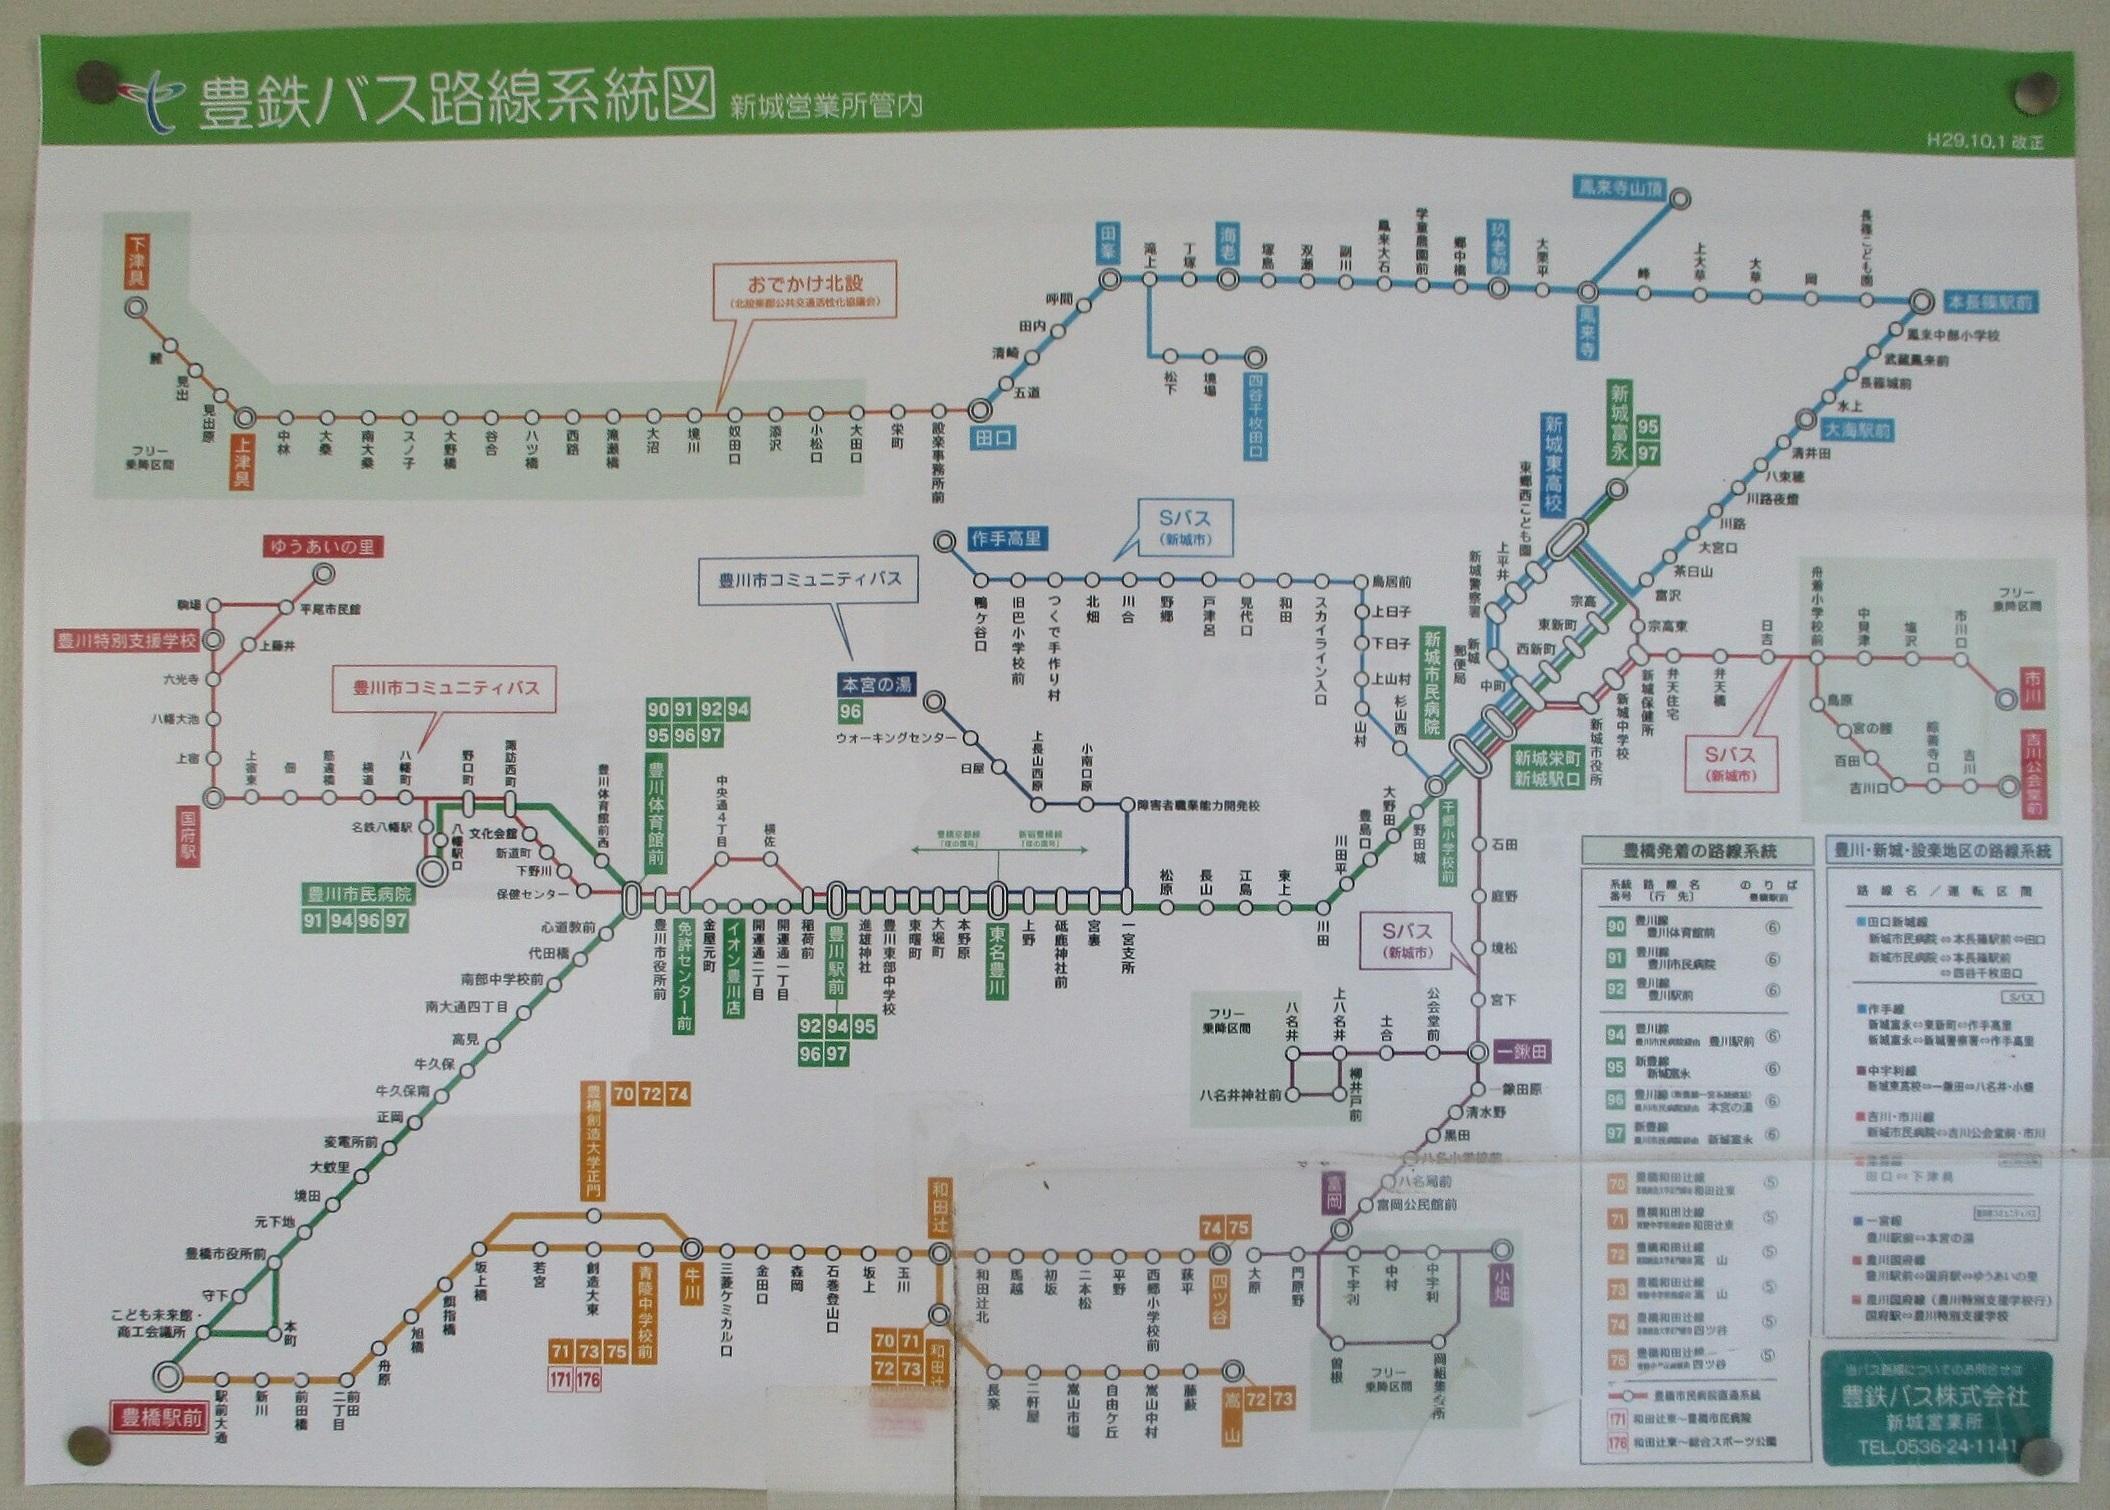 2018.12.14 (72) 本長篠駅前バス停 - 豊鉄バス路線系統図 2110-1510